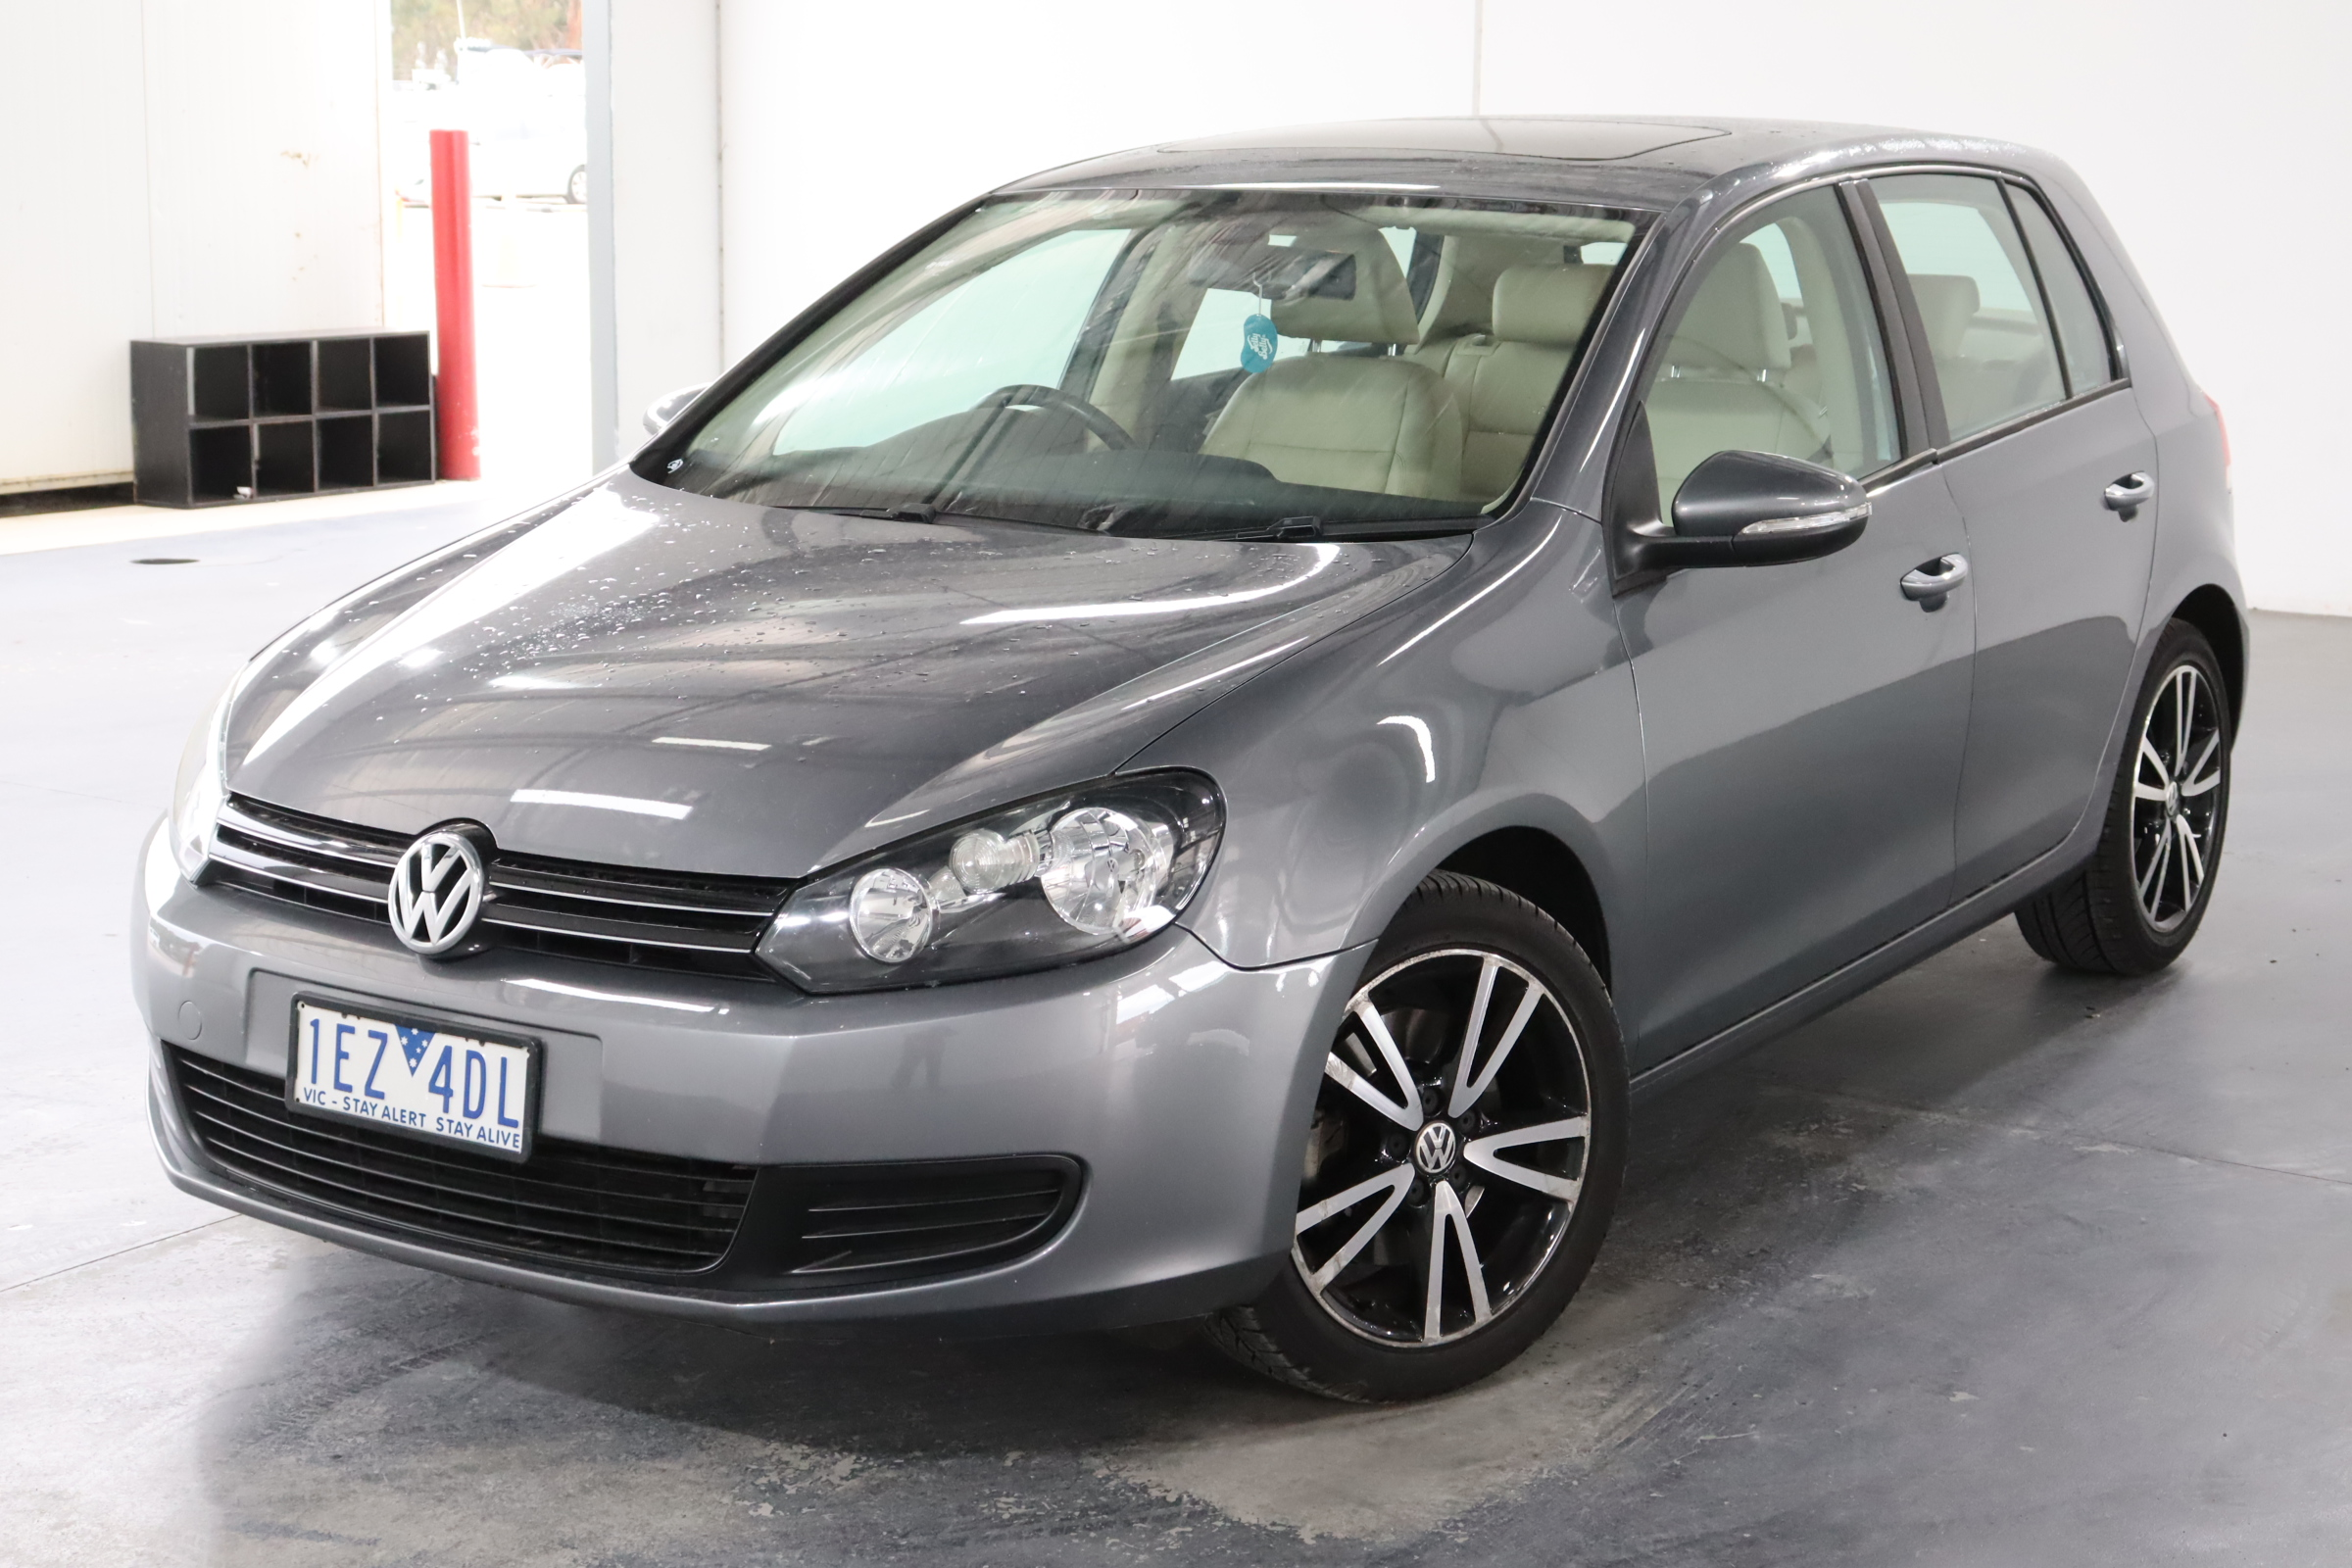 2010 Volkswagen Golf 118TSI Comfortline A6 Automatic Hatchback